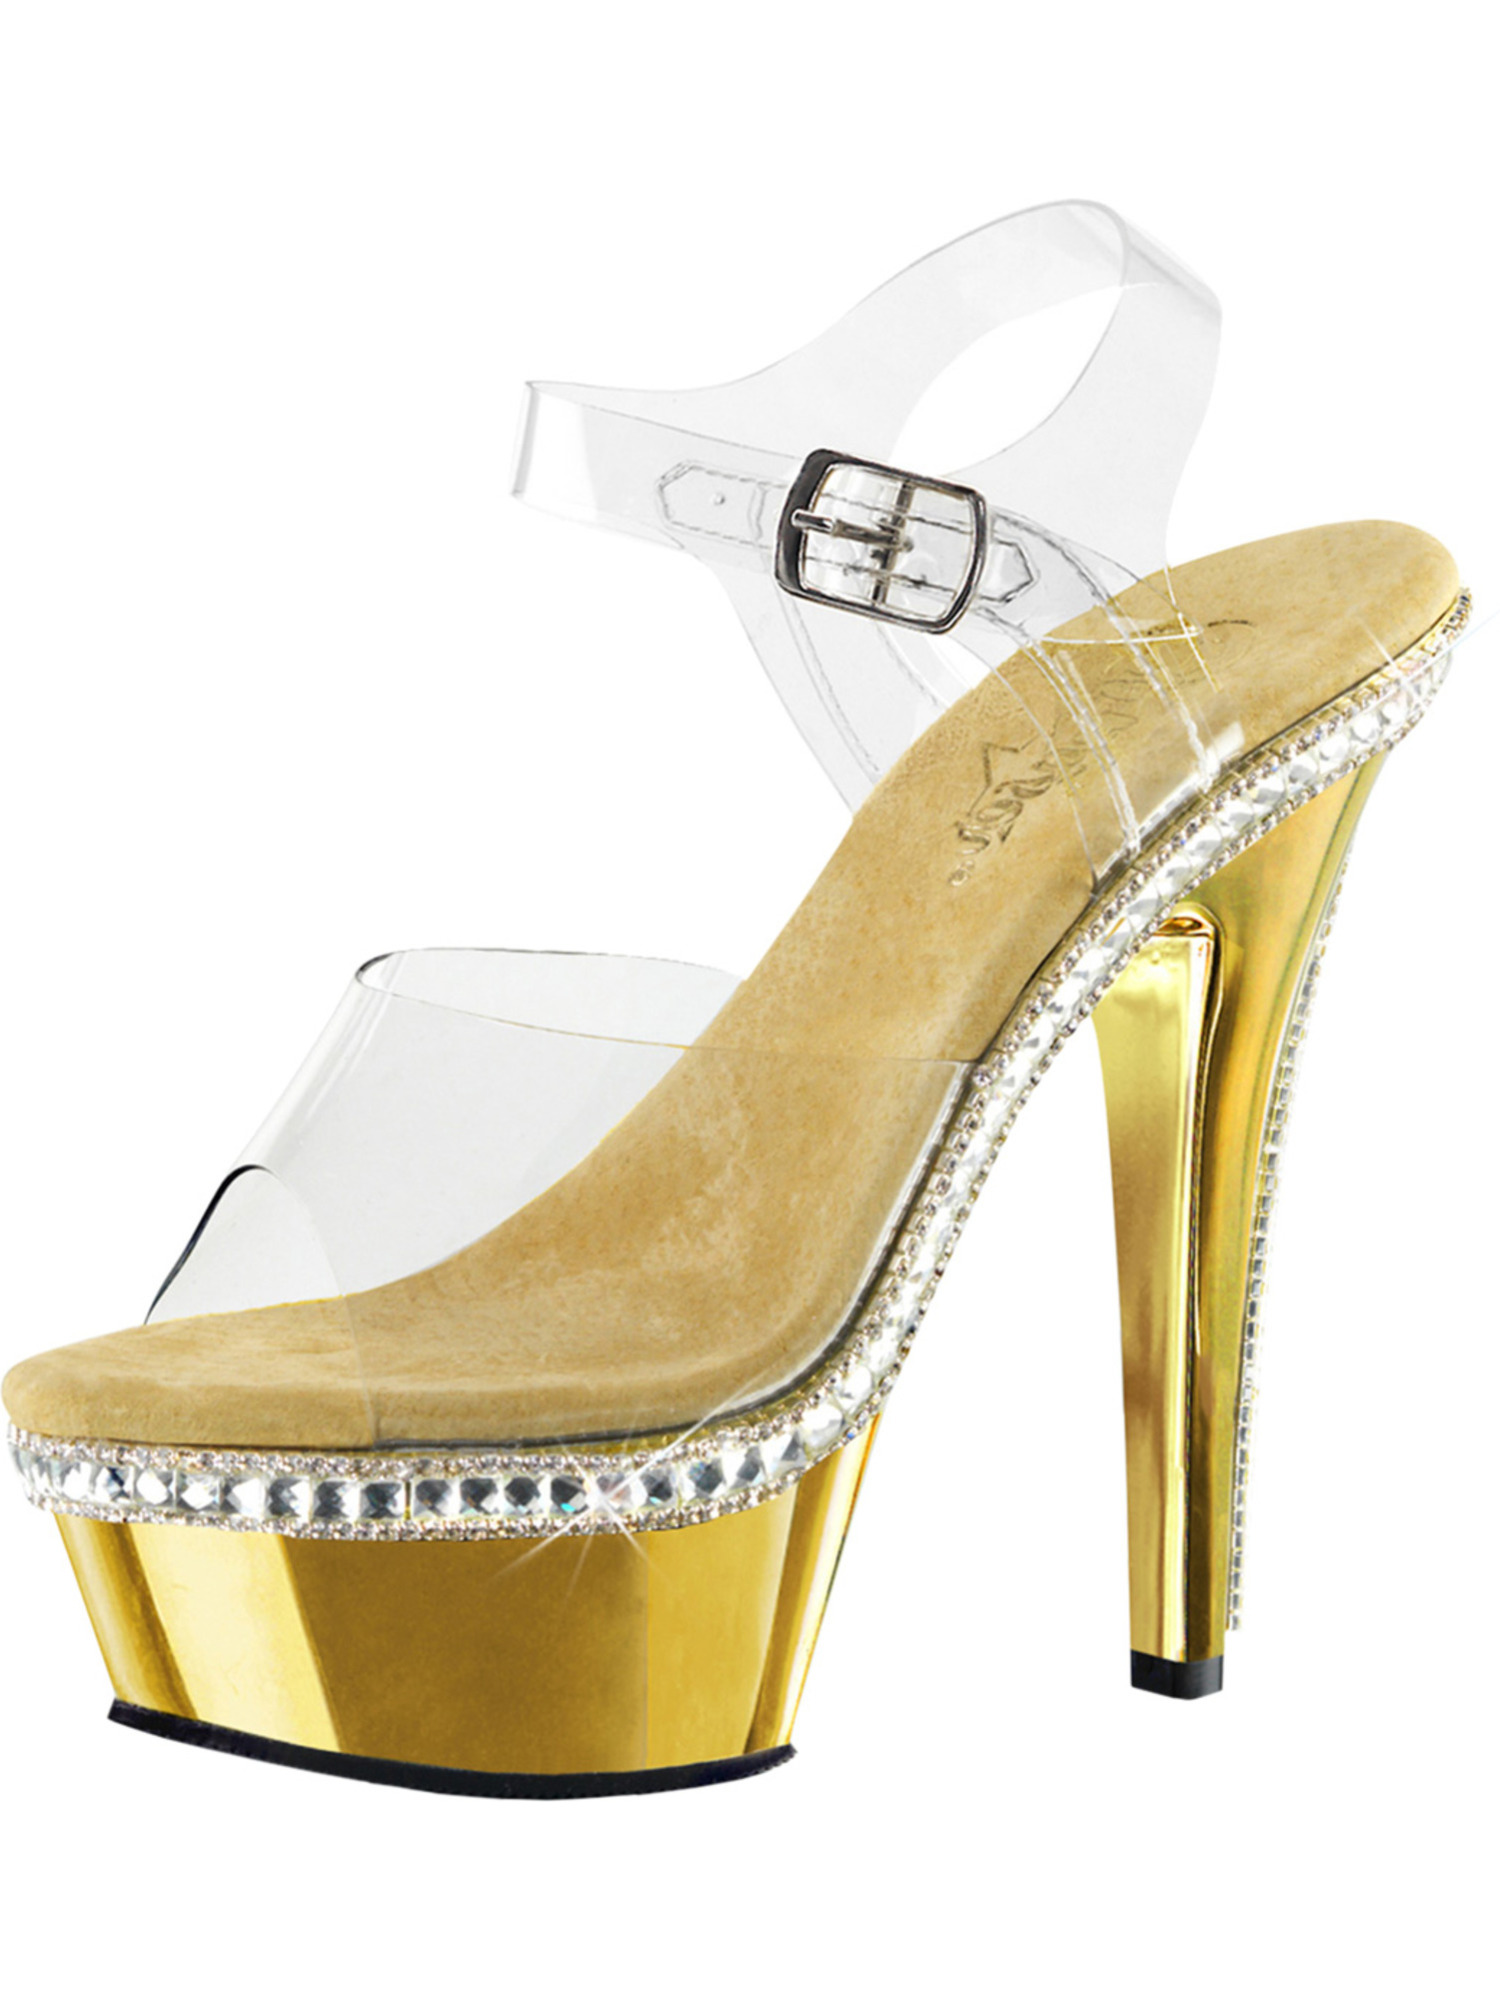 SummitFashions - Womens Gold Sandals Rhinestone Shoes Clear Ankle Strap  Platform 6 Inch Heels - Walmart.com